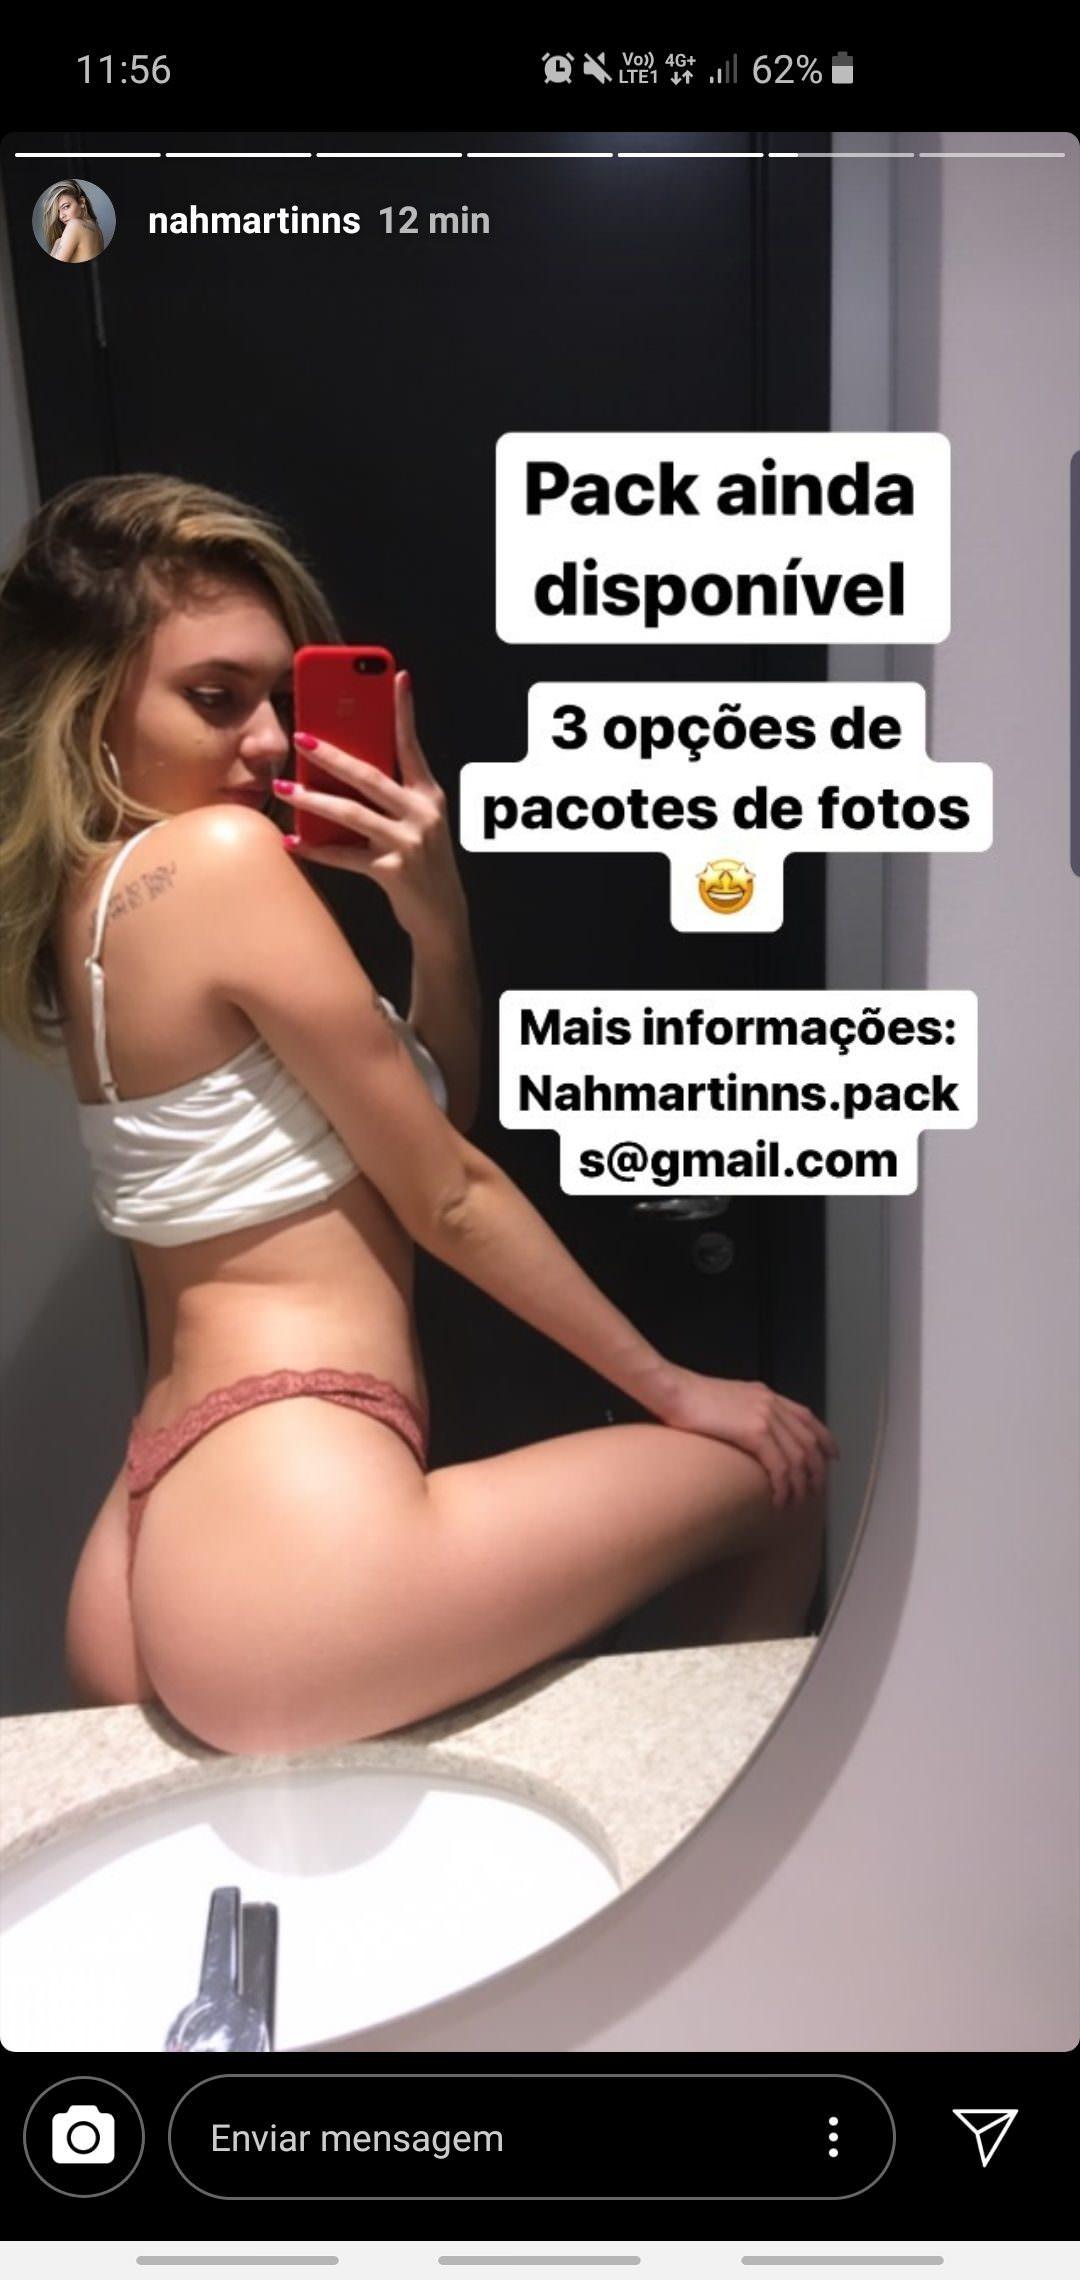 Natalia Martins Nude Photos! (nahmartinns) 0009